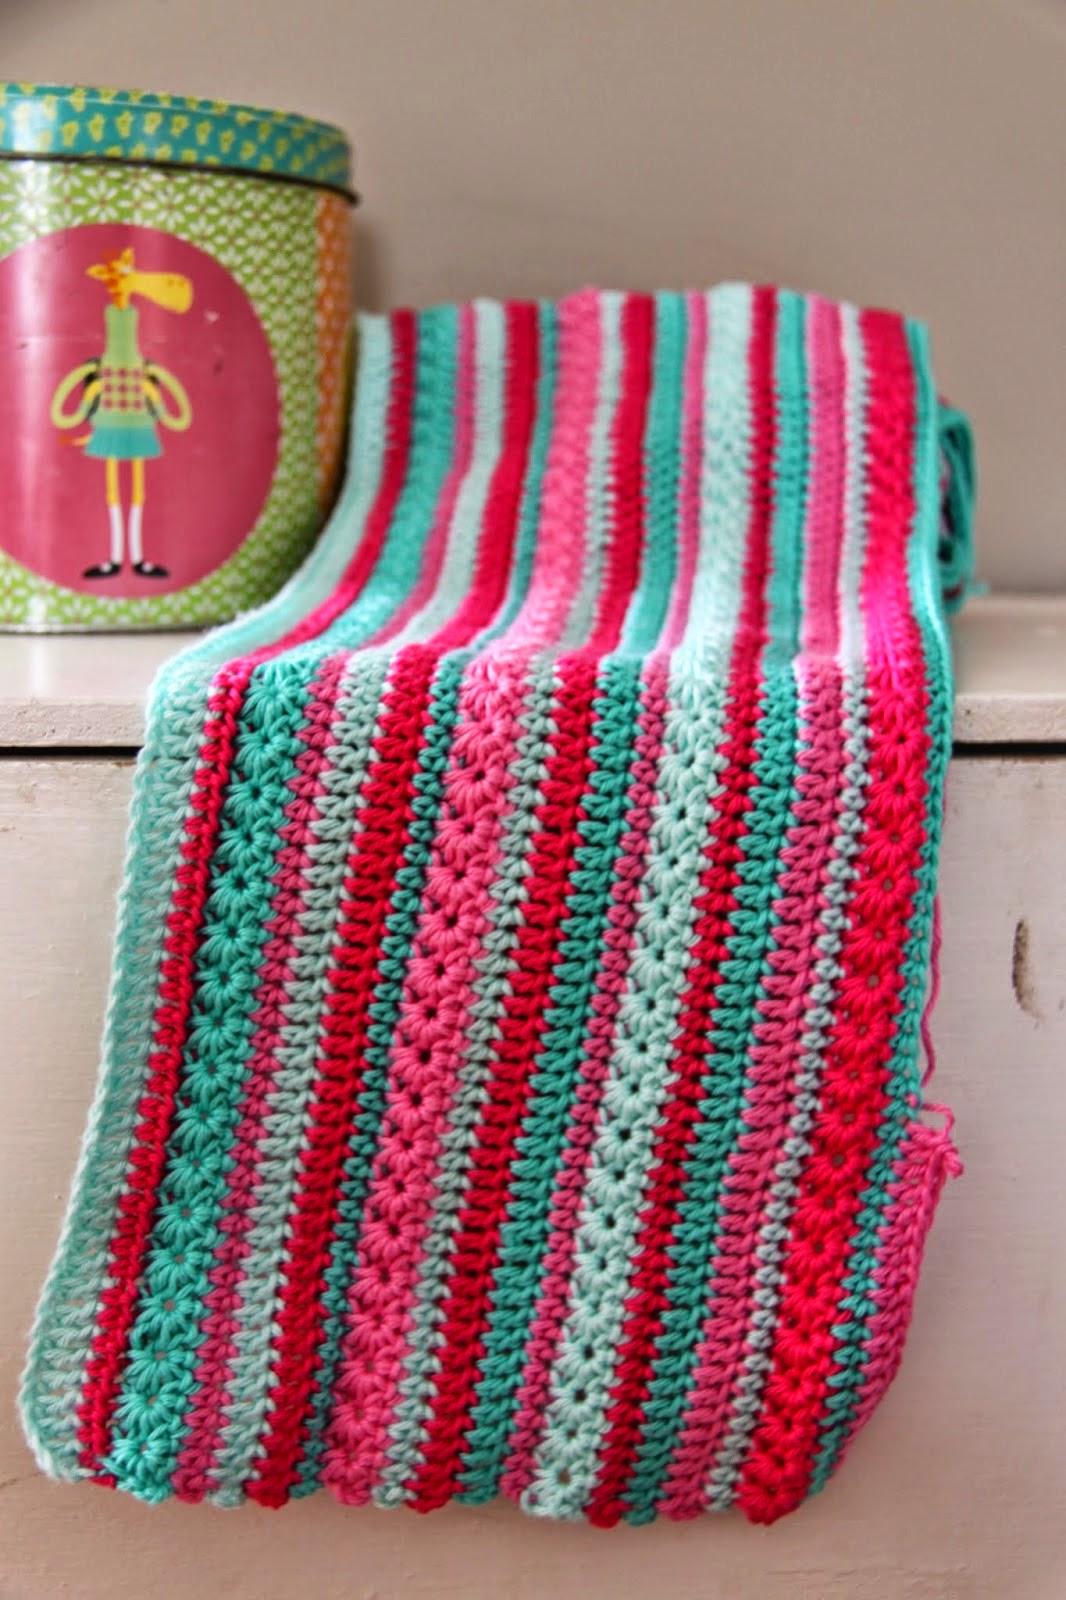 http://ak-at-home.blogspot.nl/2014/02/crochet-deken-zoet.html